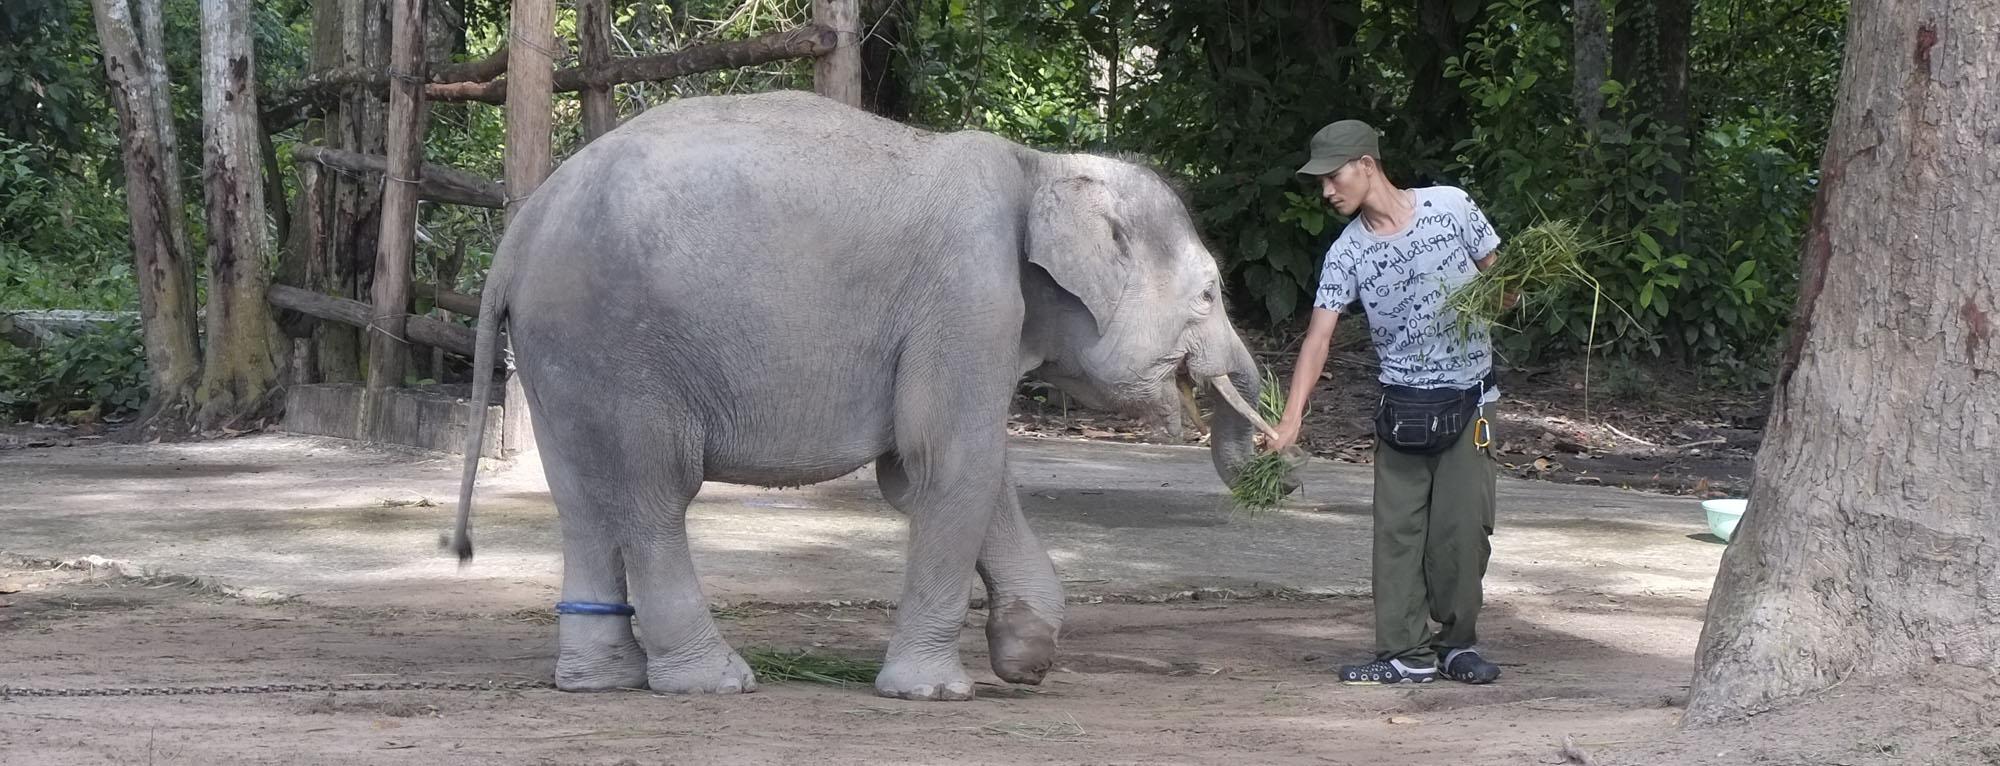 reise-ansichten Yok Don Elefant